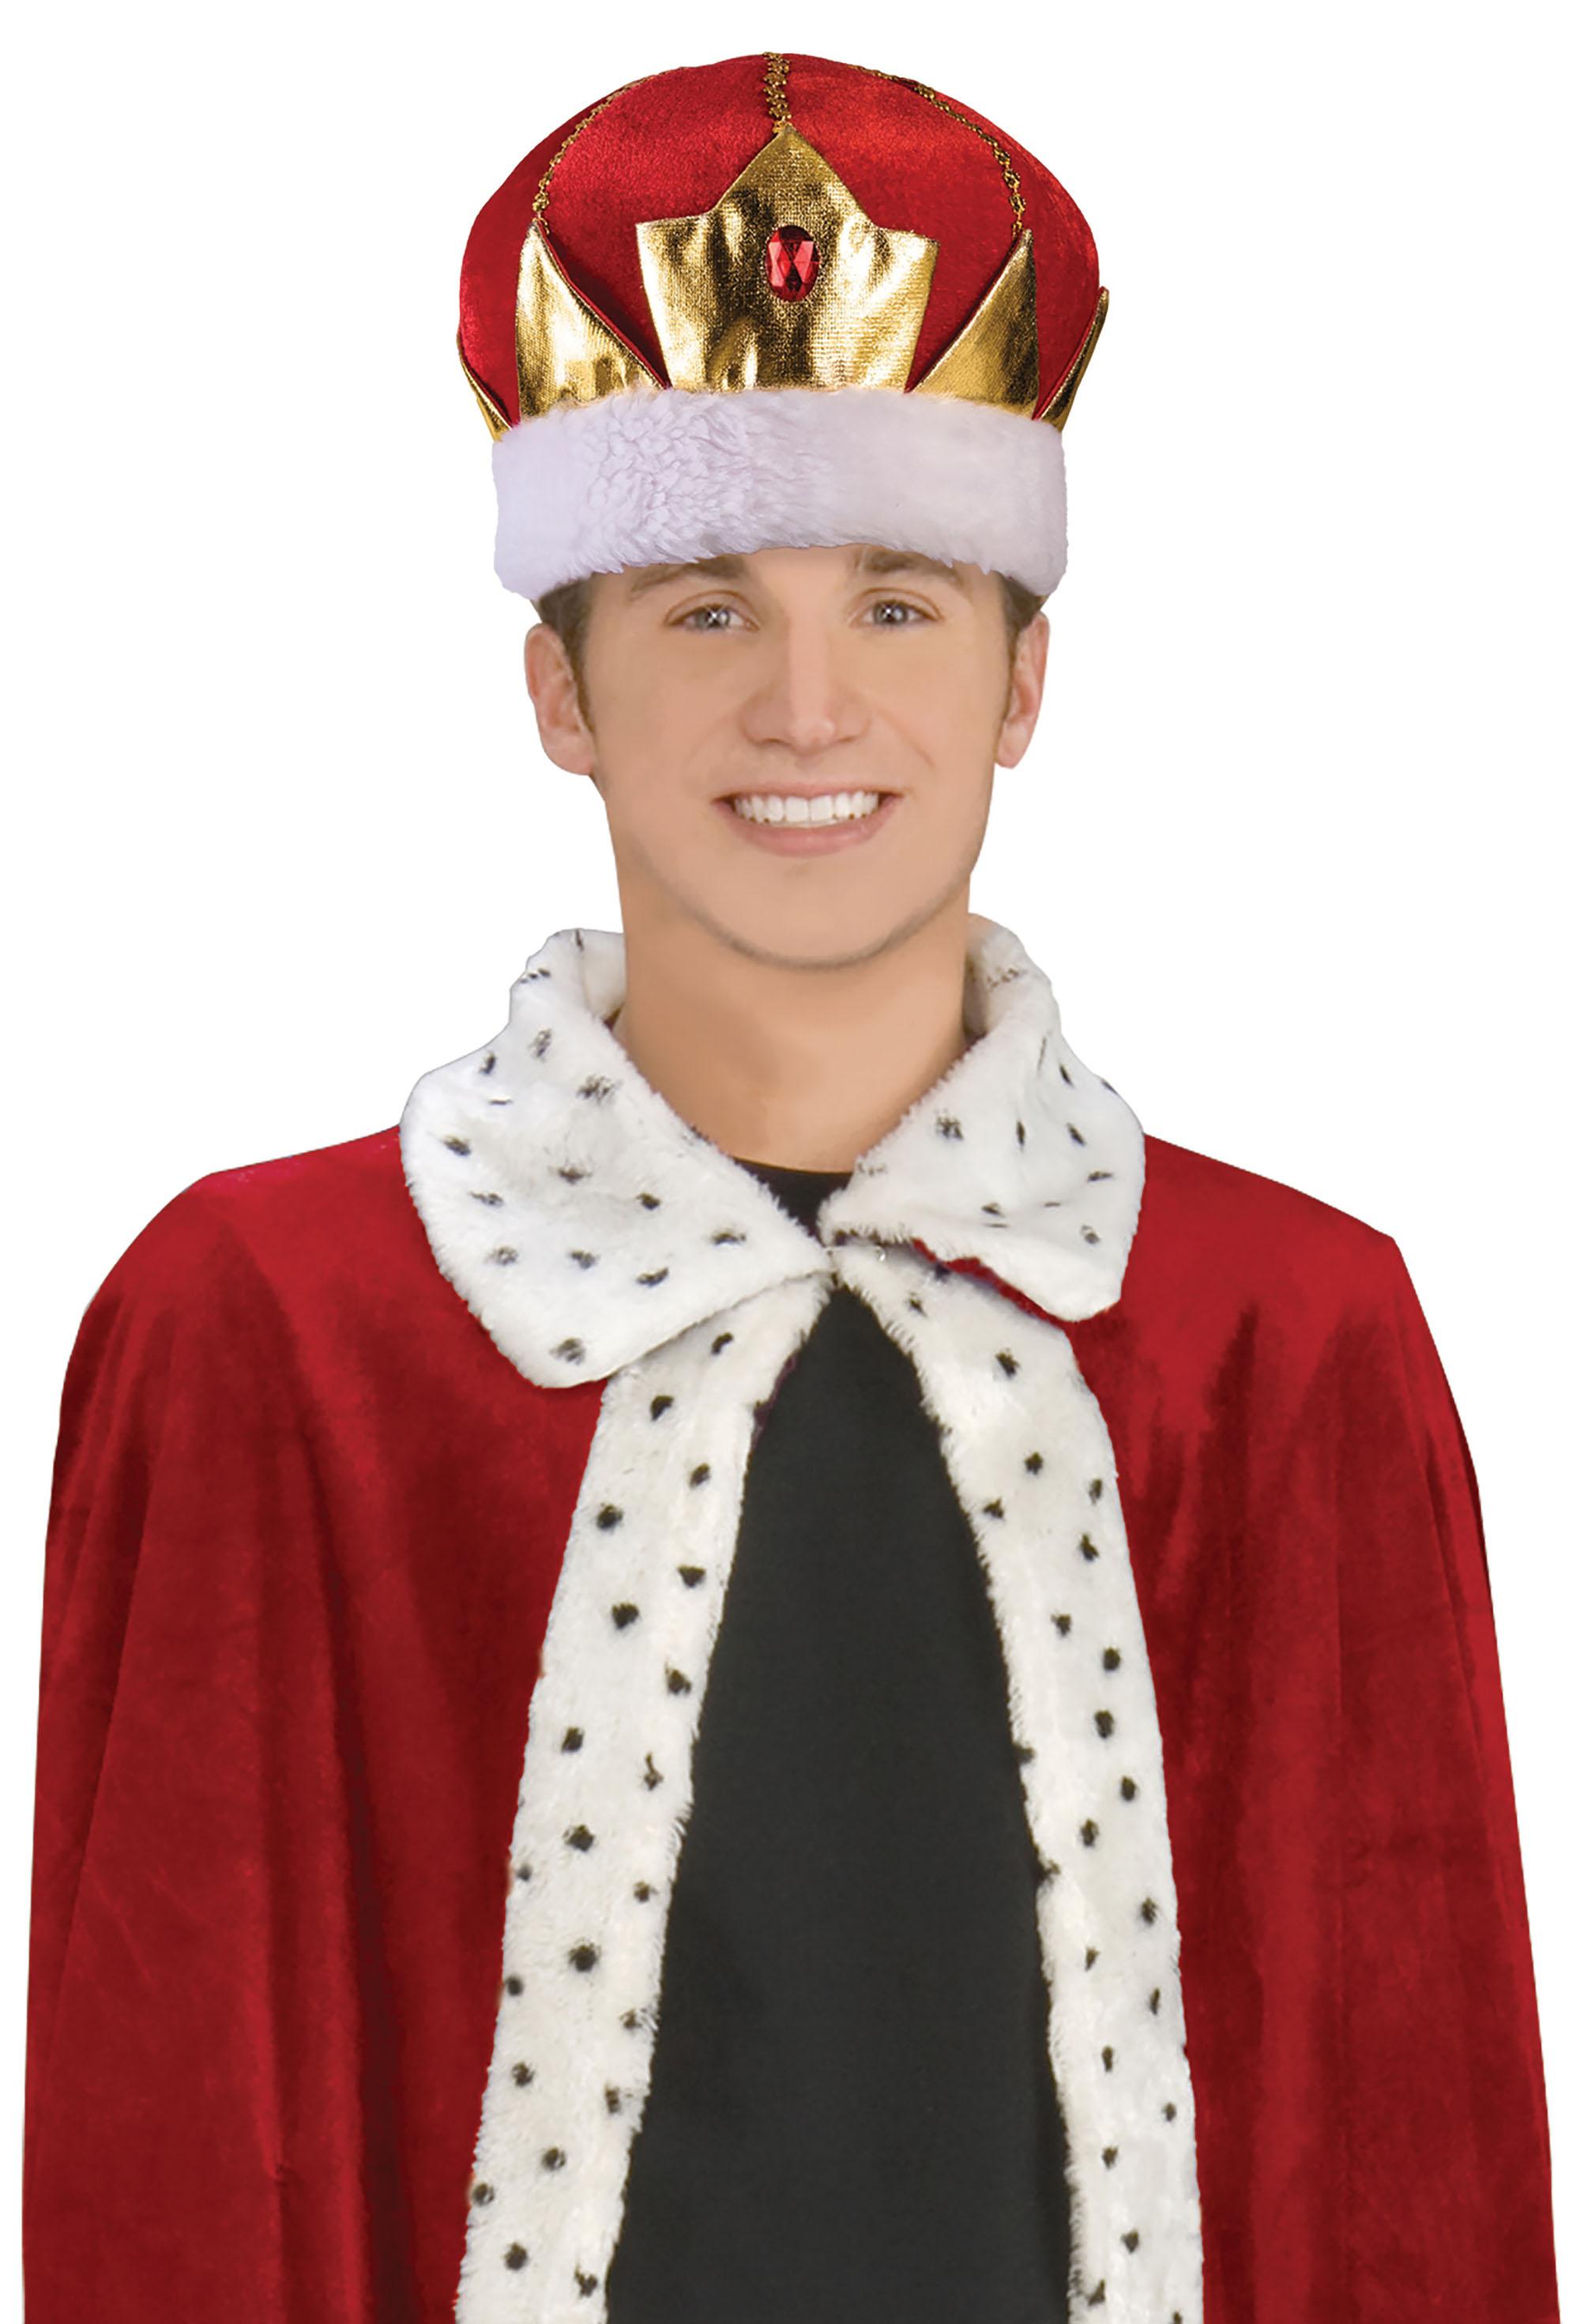 King Hat Red Soft Fancy Dress Accessory